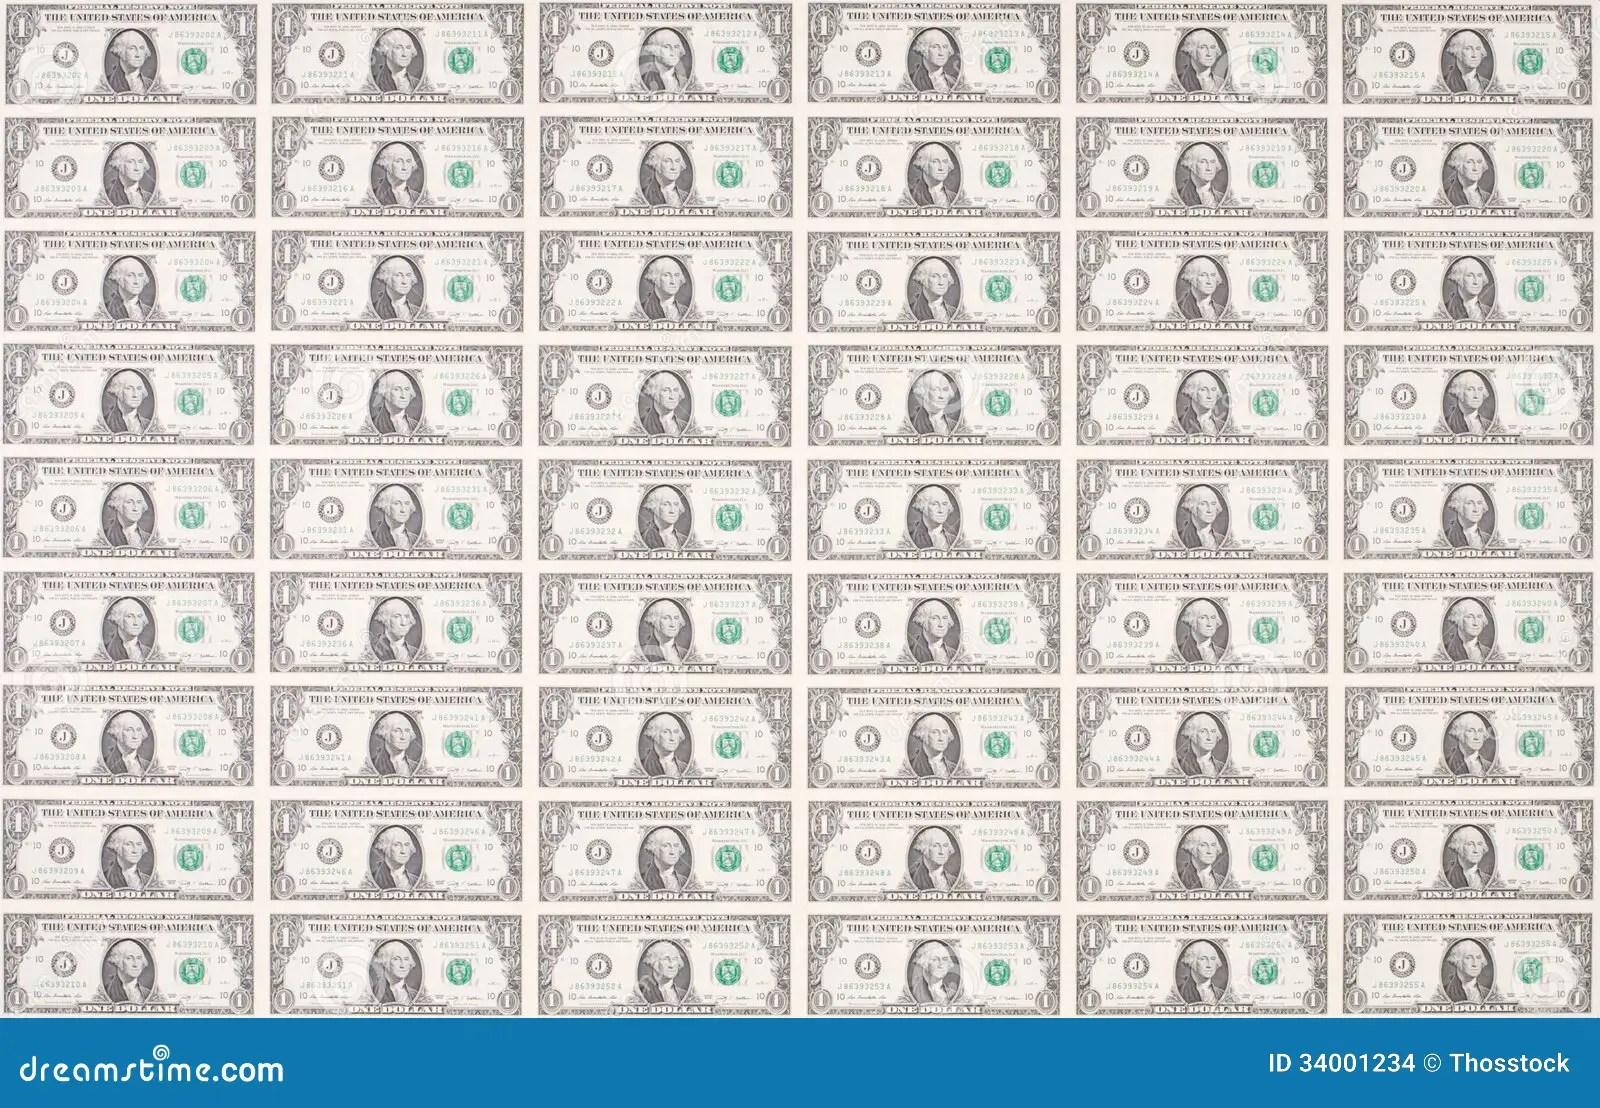 Sheet Of One Dollar Bills As Wallpaper Stock Photo